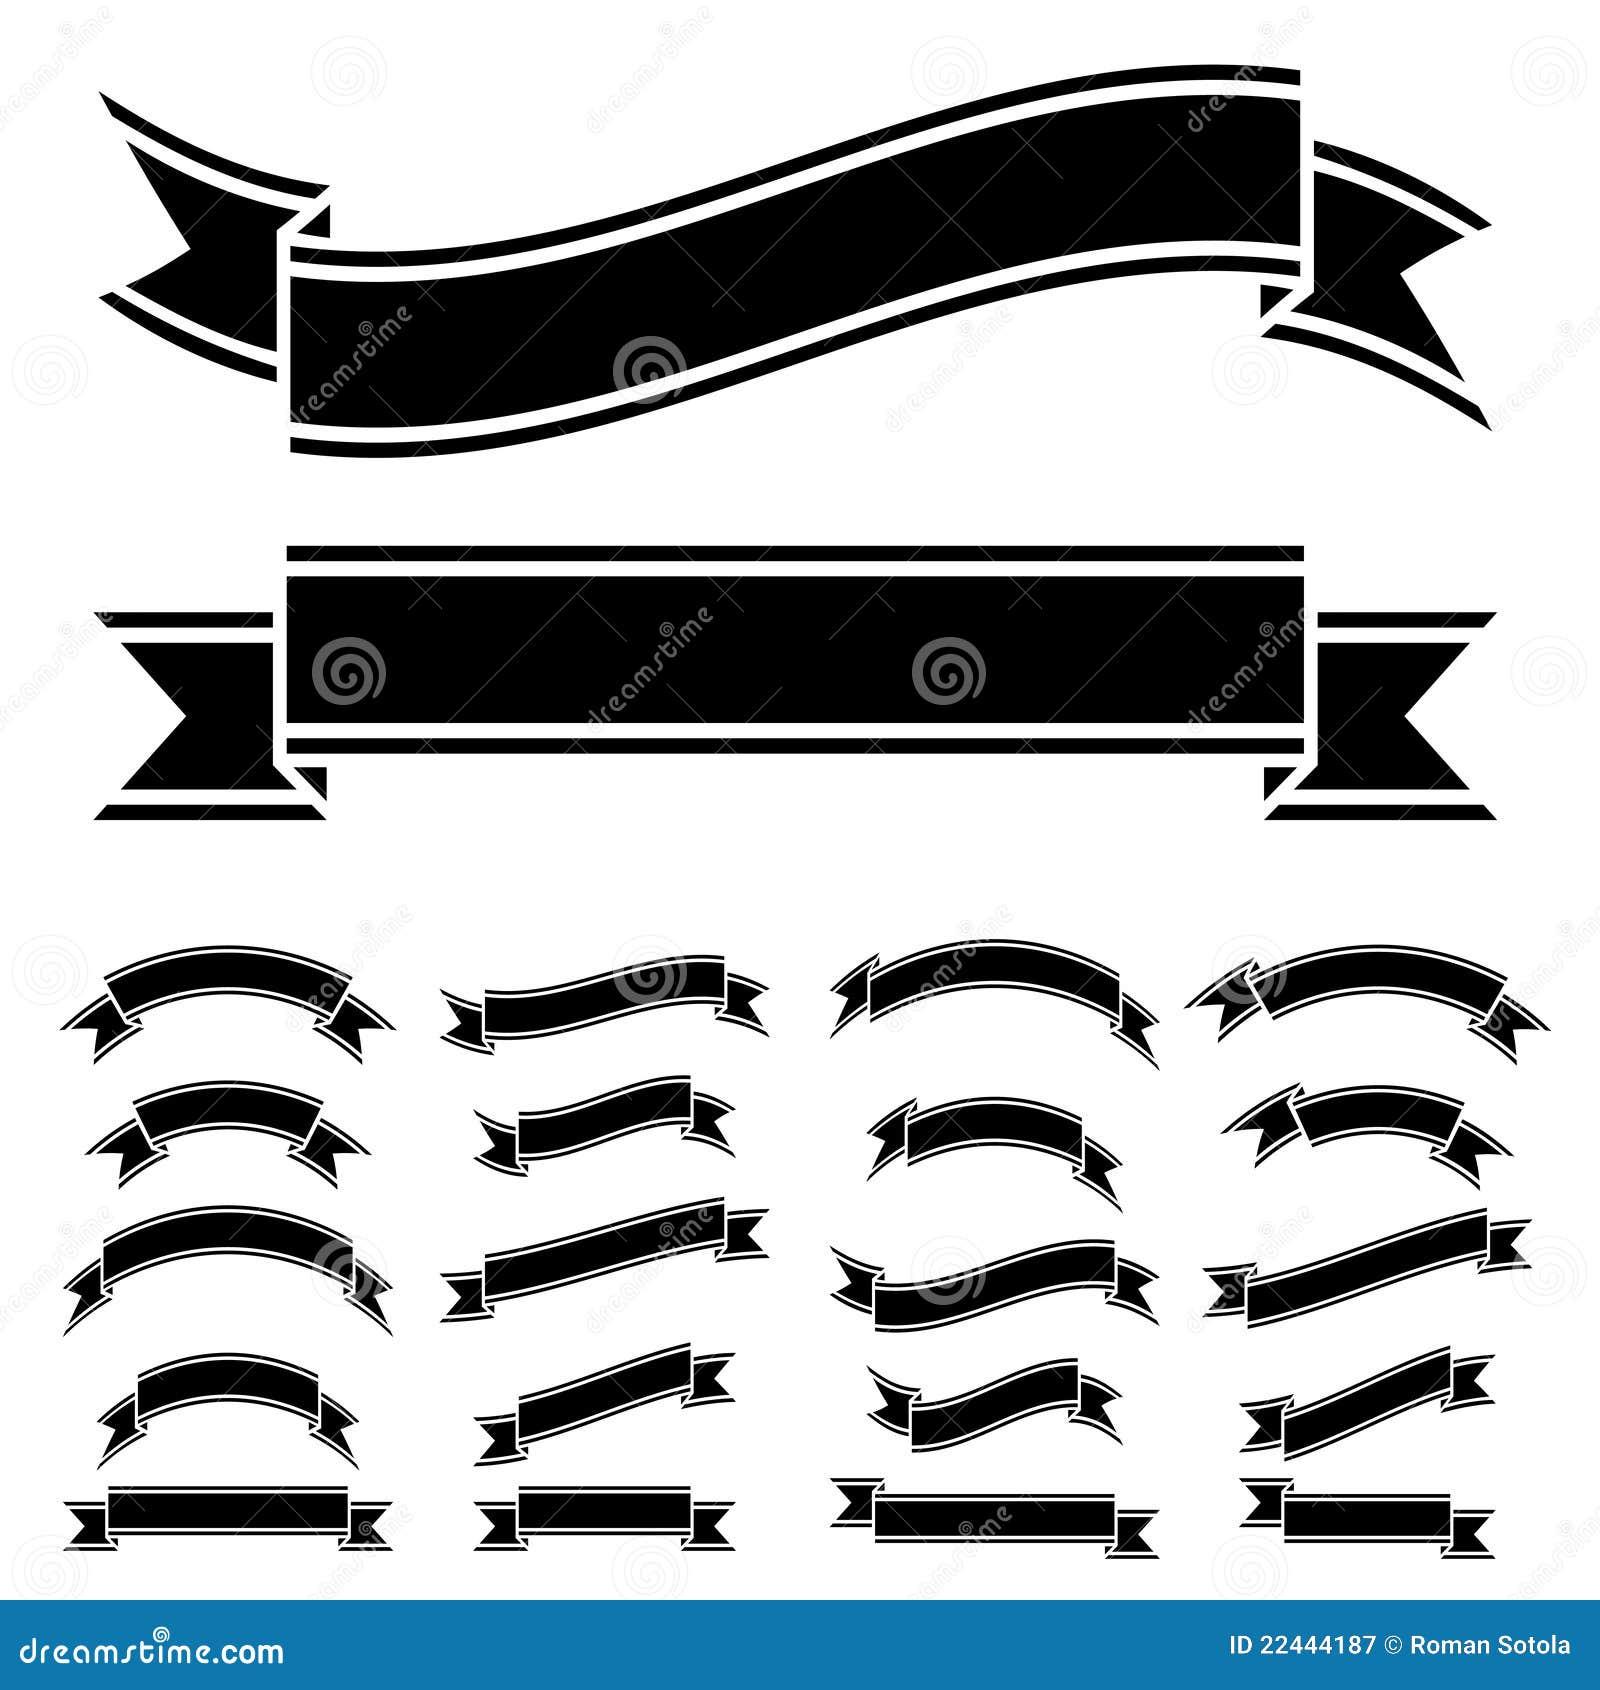 Black And White Ribbon Symbols Royalty Free Stock Photography - Image ...